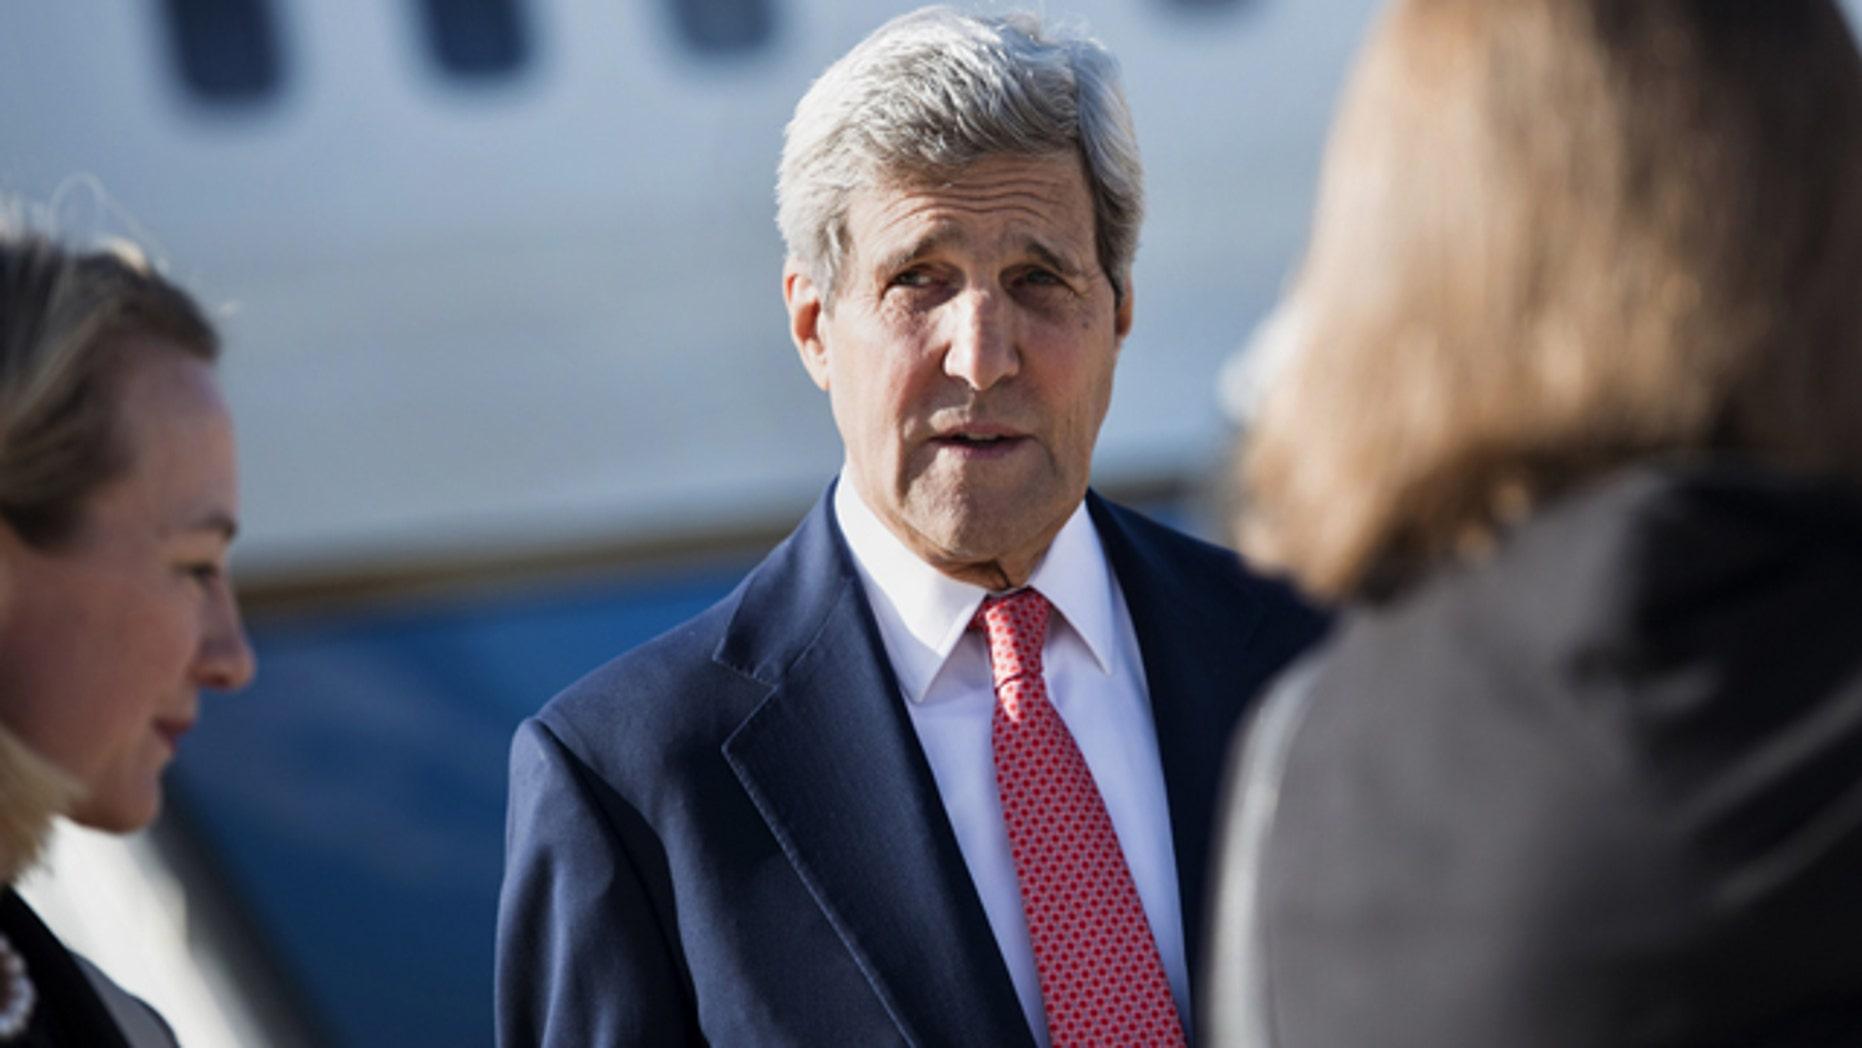 September 10, 2014: U.S. Secretary of State John Kerry arrives at Queen Alia Airport in Amman, Jordan. (AP Photo/Brendan Smialowski, Pool)